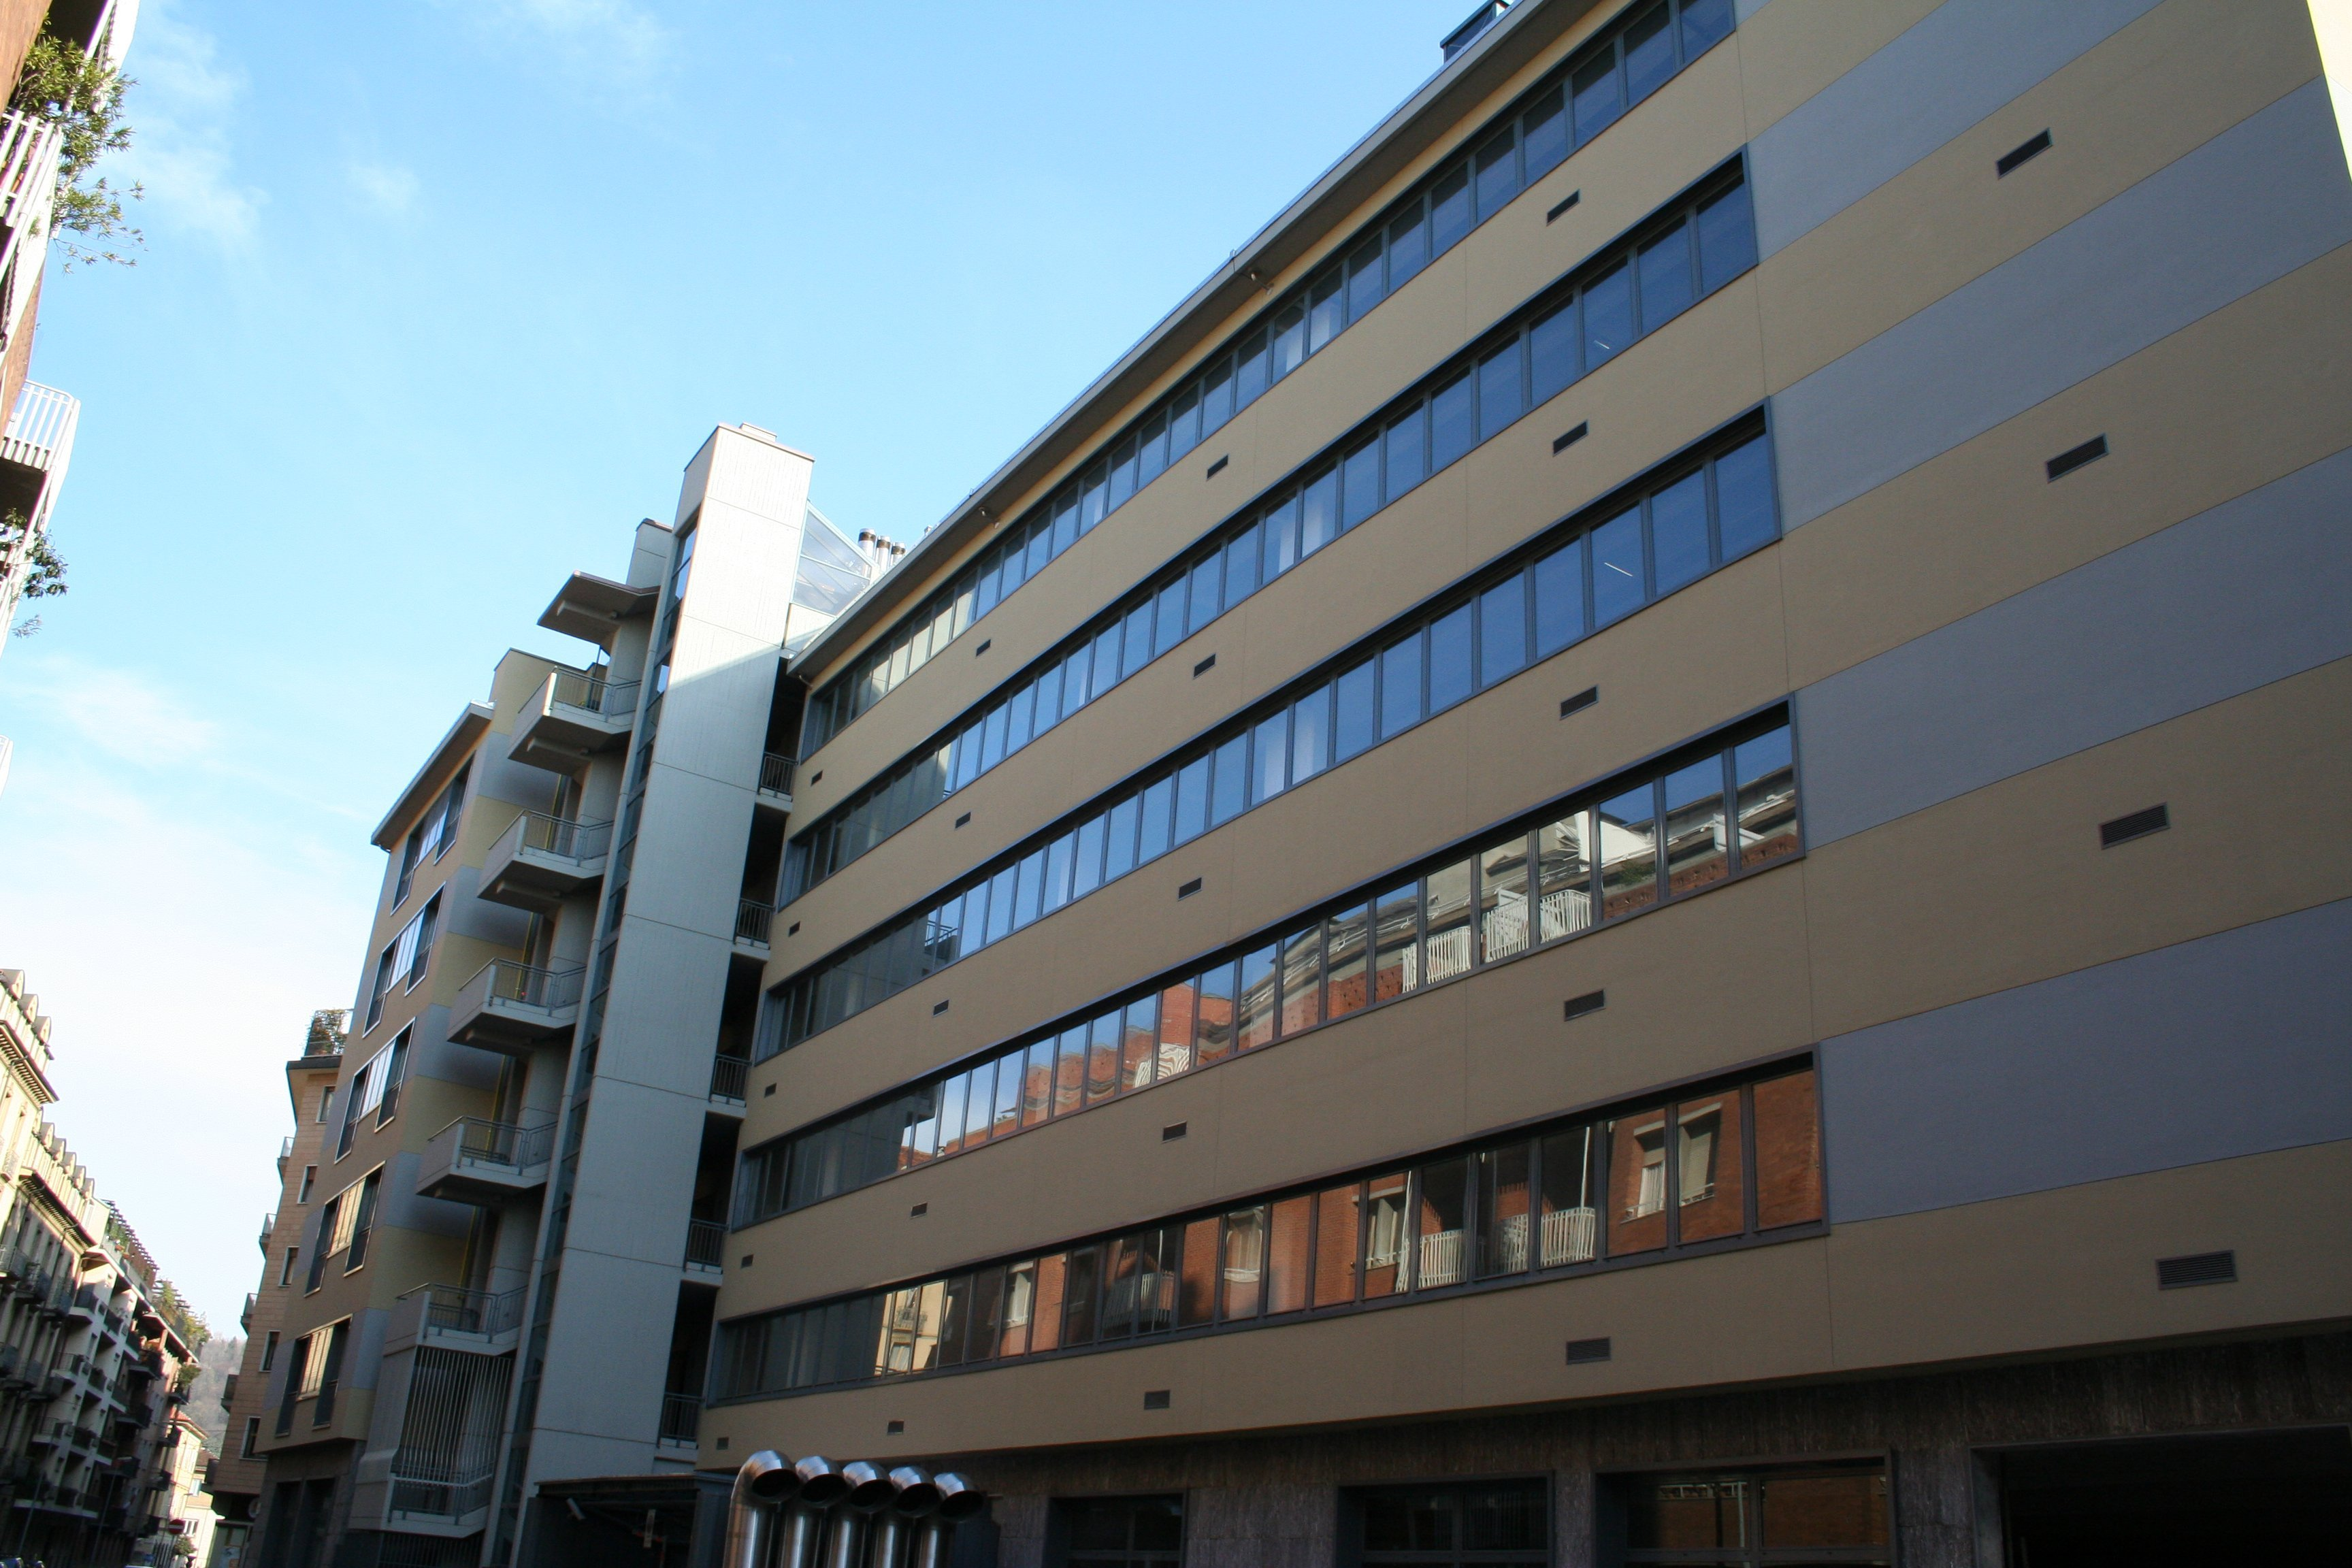 Facciata edificio moderno